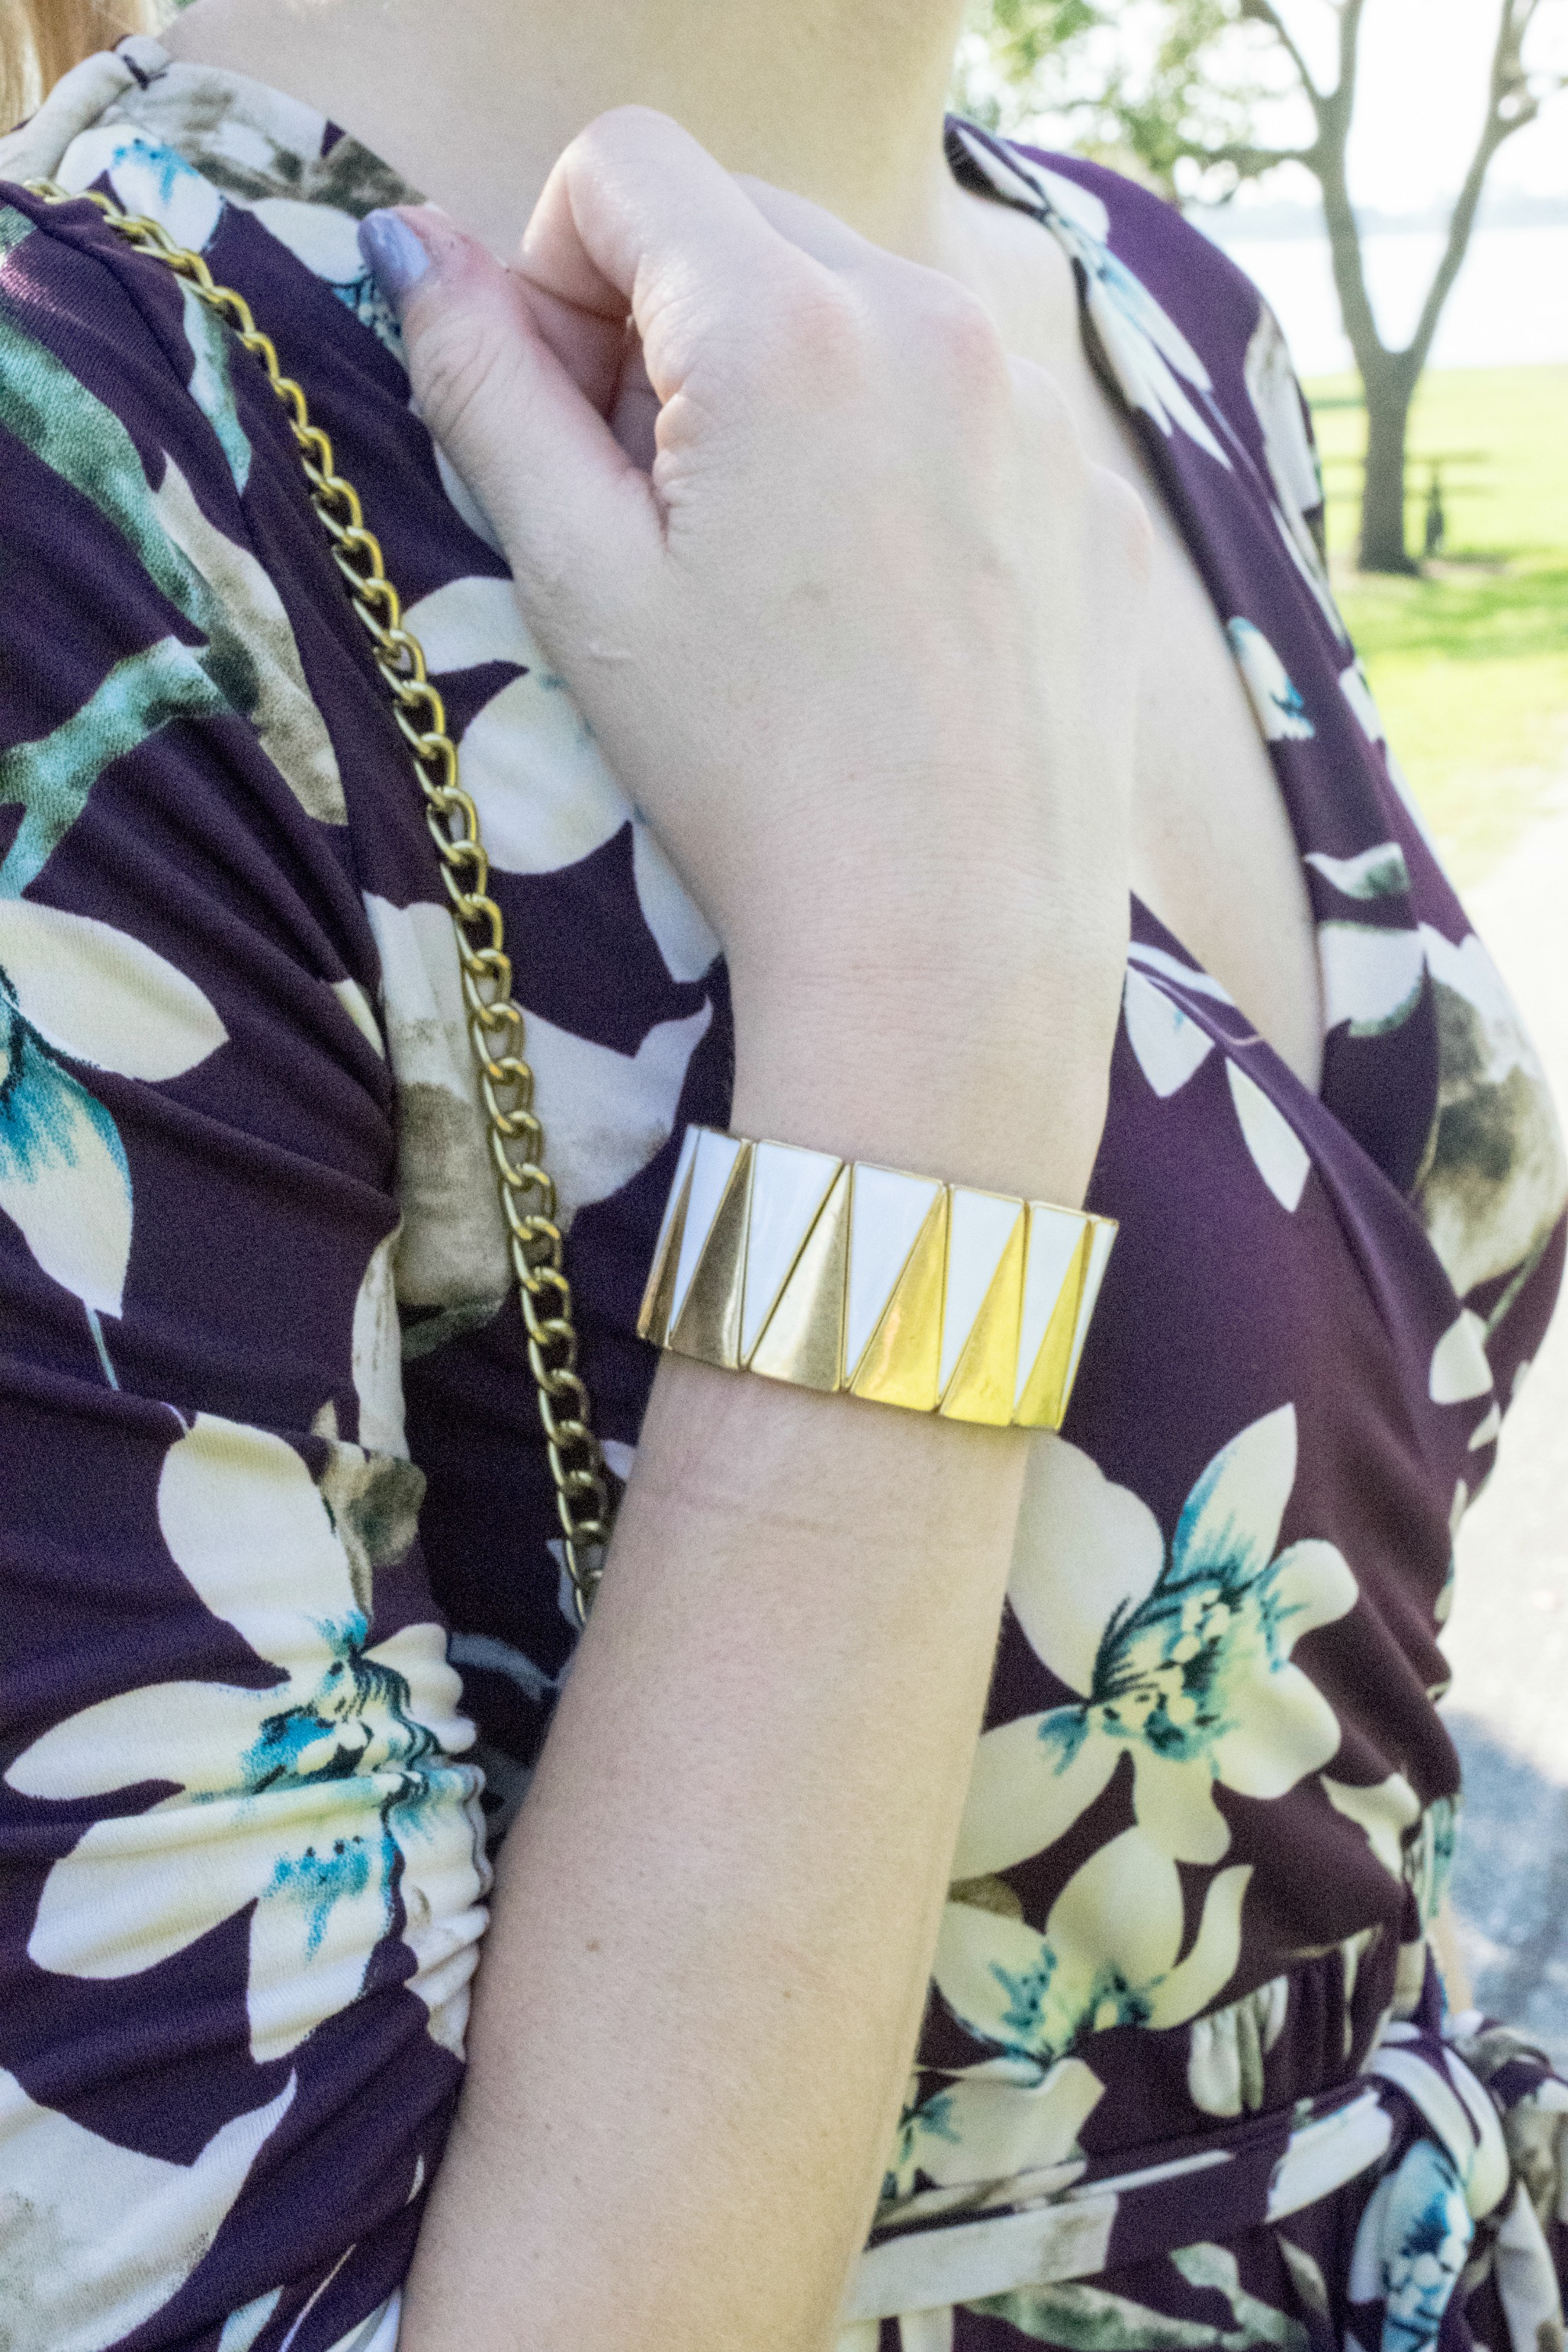 Houston Fashion Blogger - Sarah Jacot - Shop Pink Blush Influencer (7).jpg